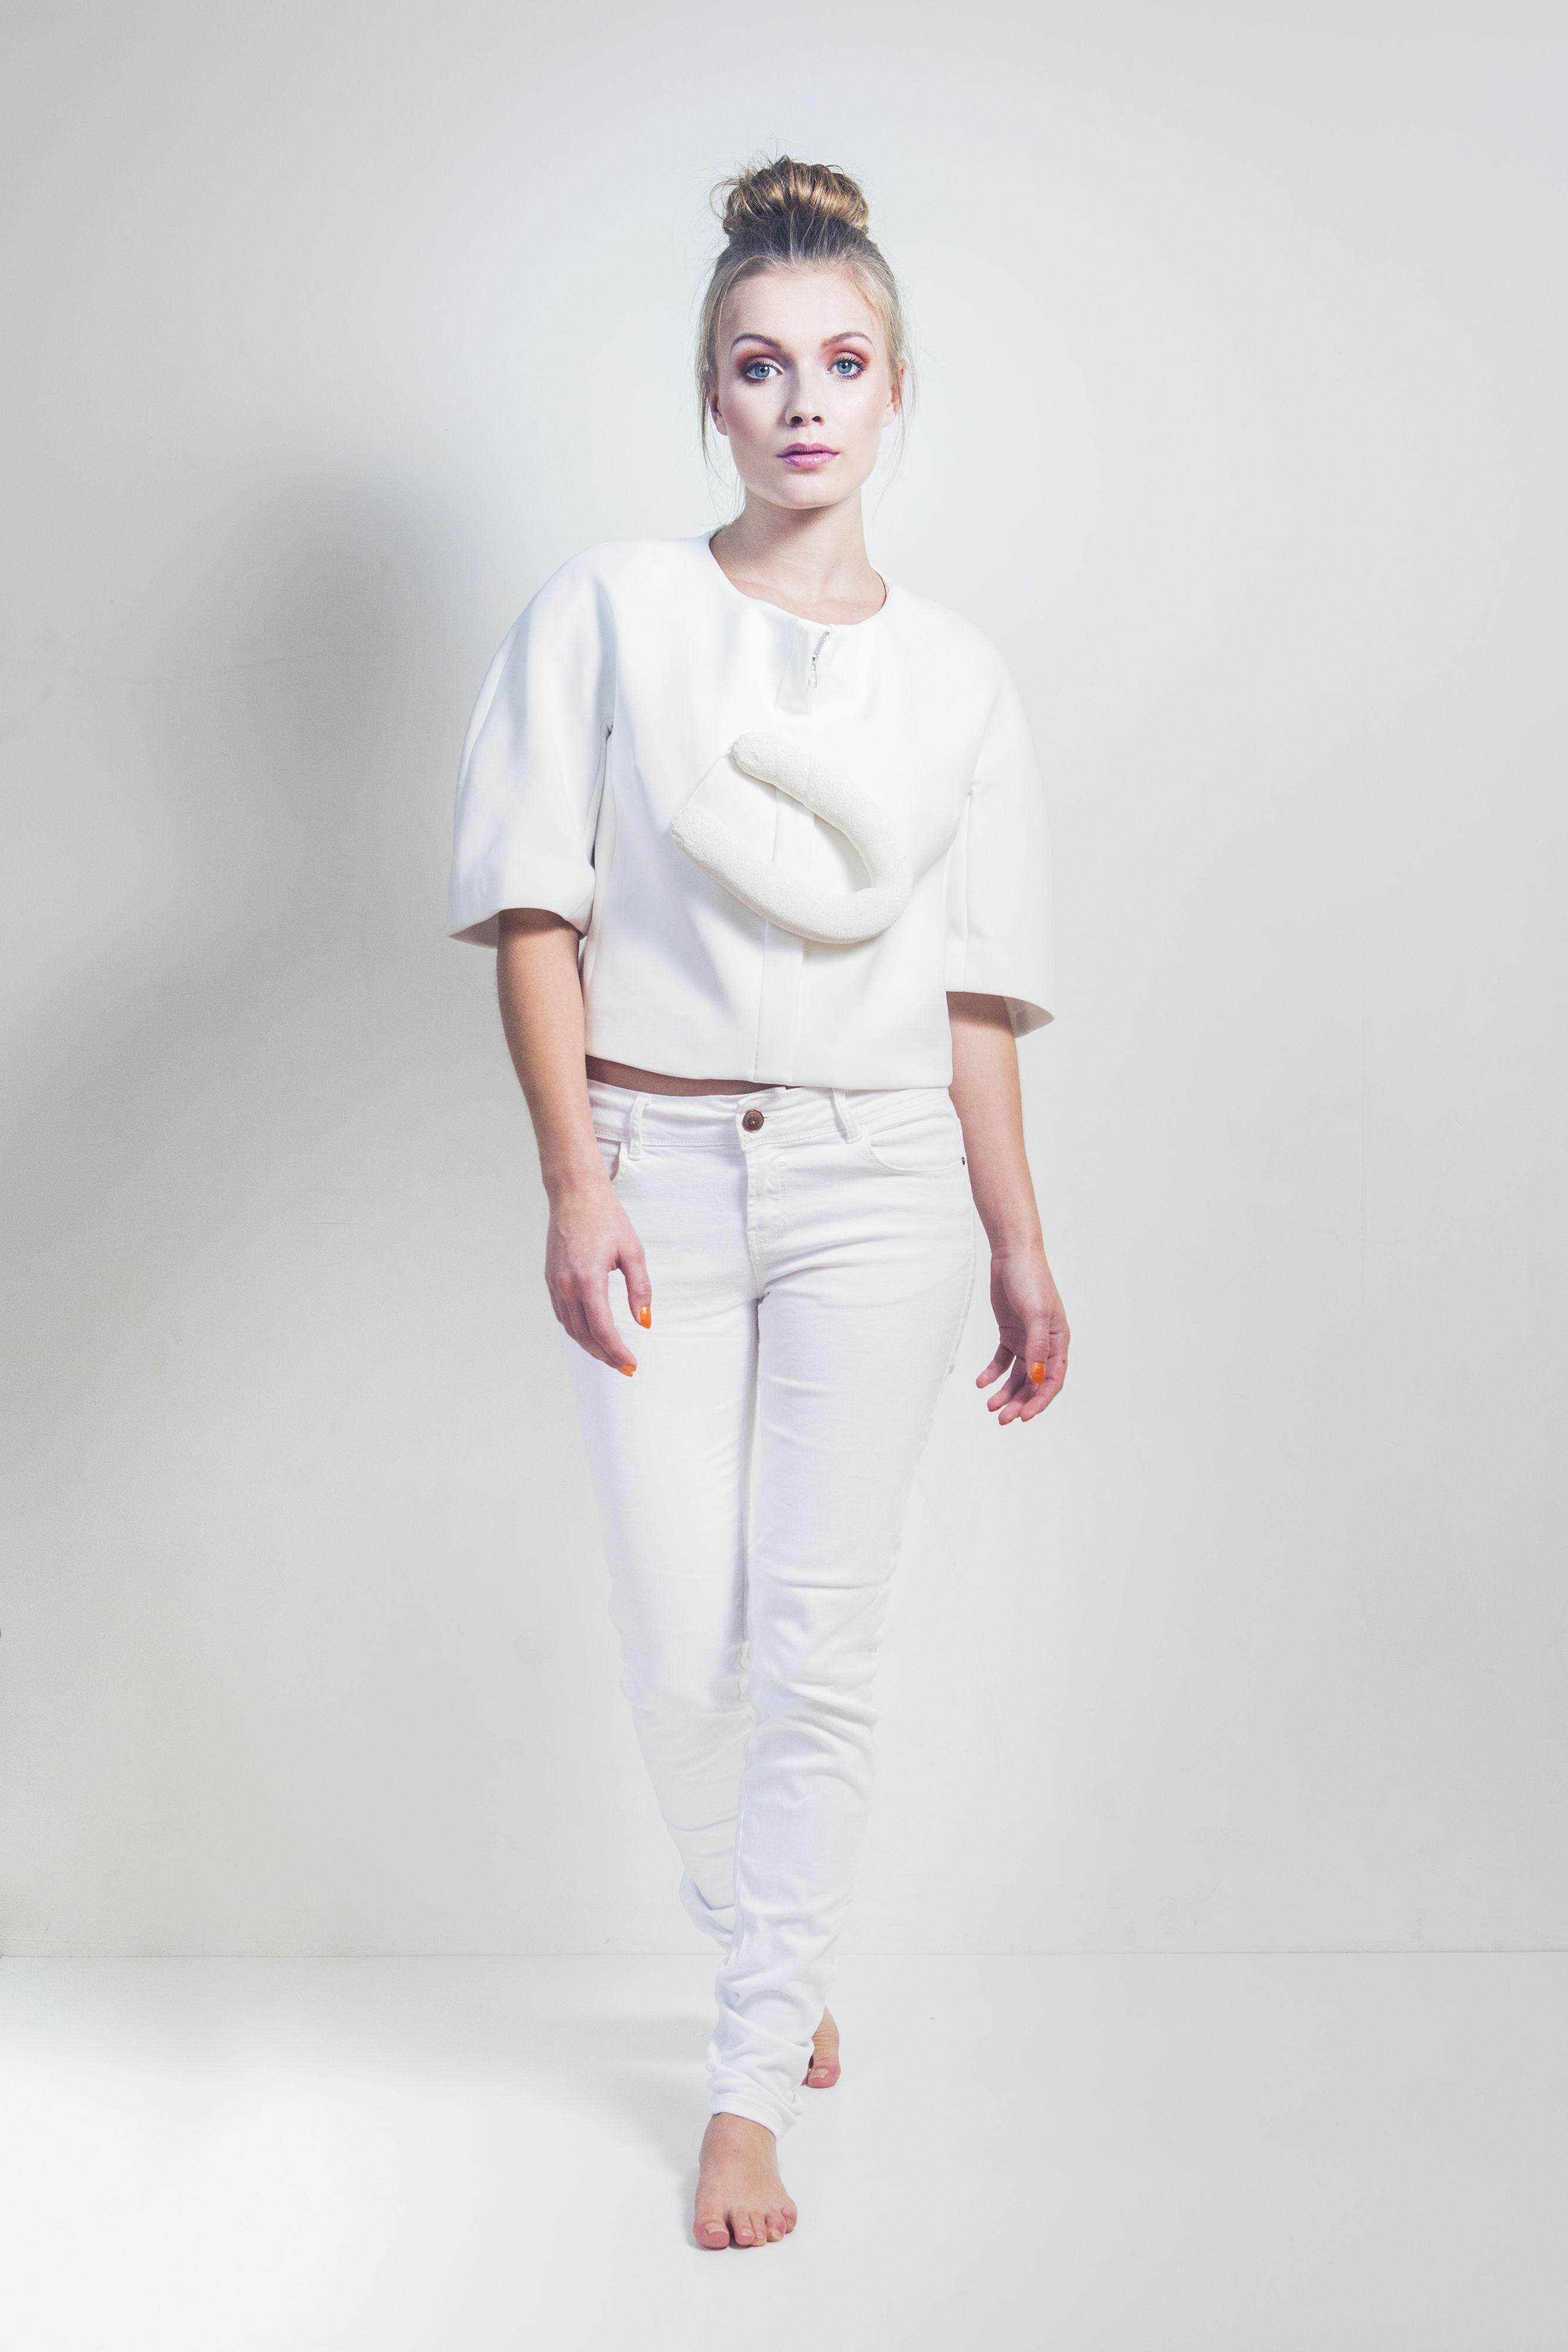 #fashion #model #white #photography #makeup